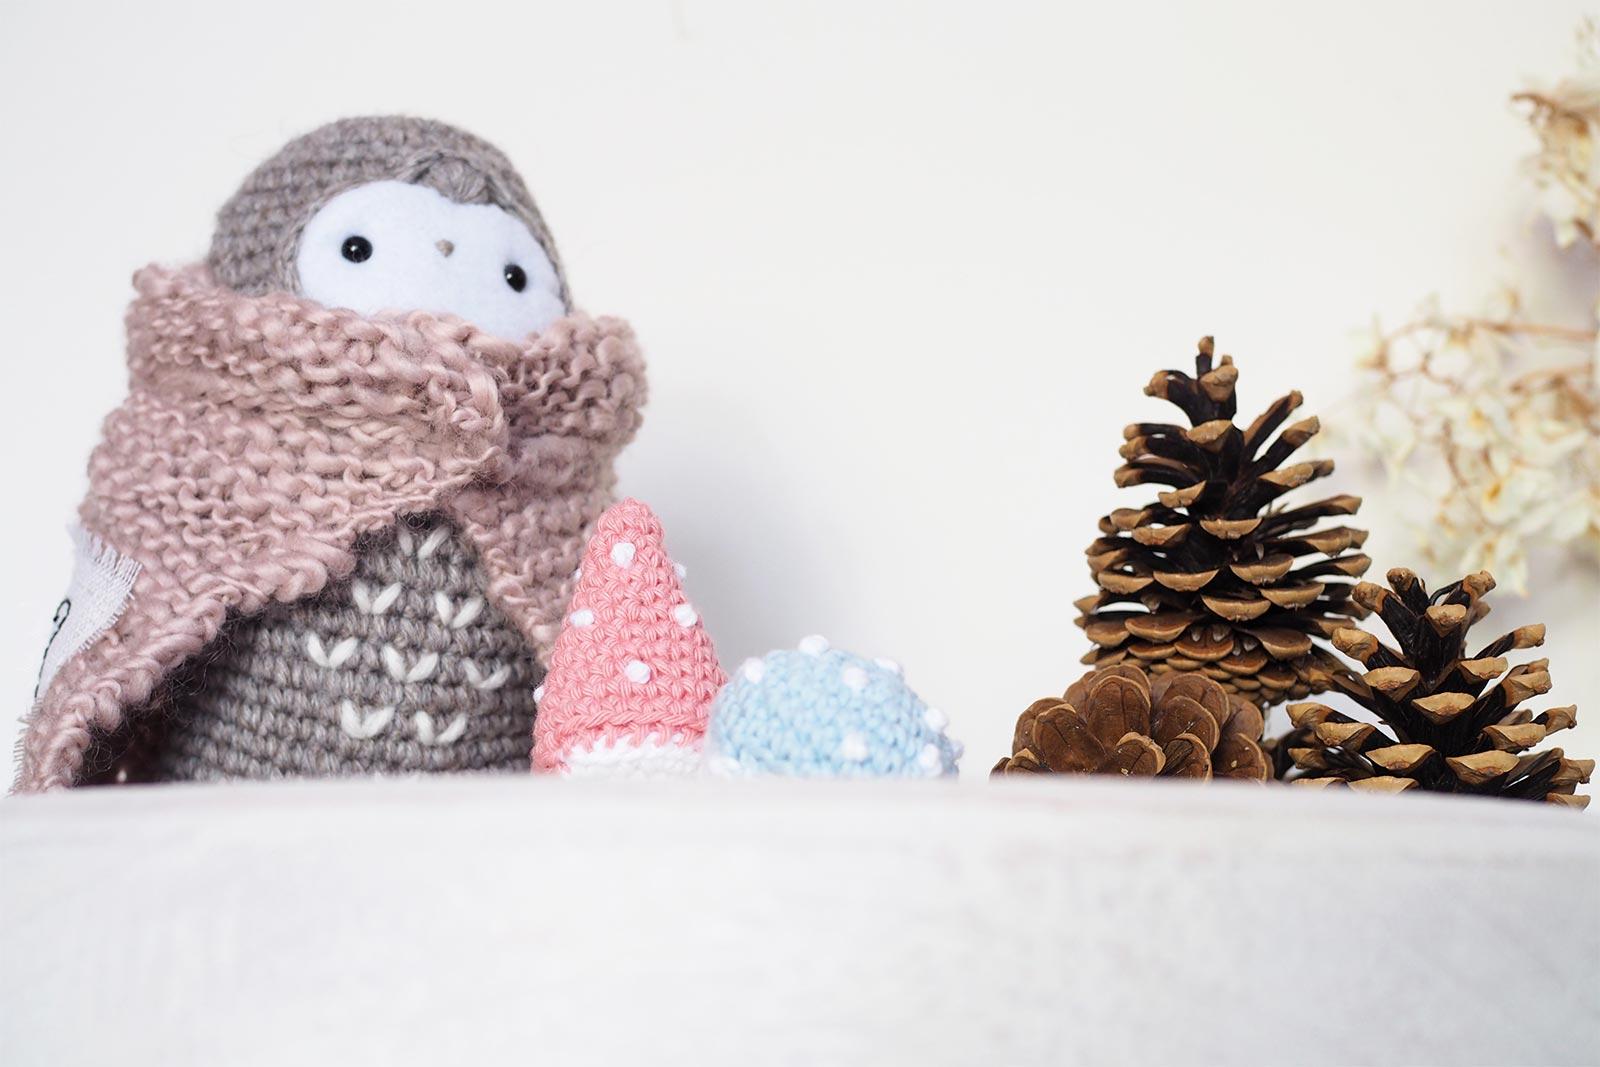 crochet owl chouette lutine champignons serial crocheteuses 452 automne mafabriquebykaro laboutiquedemelimelo